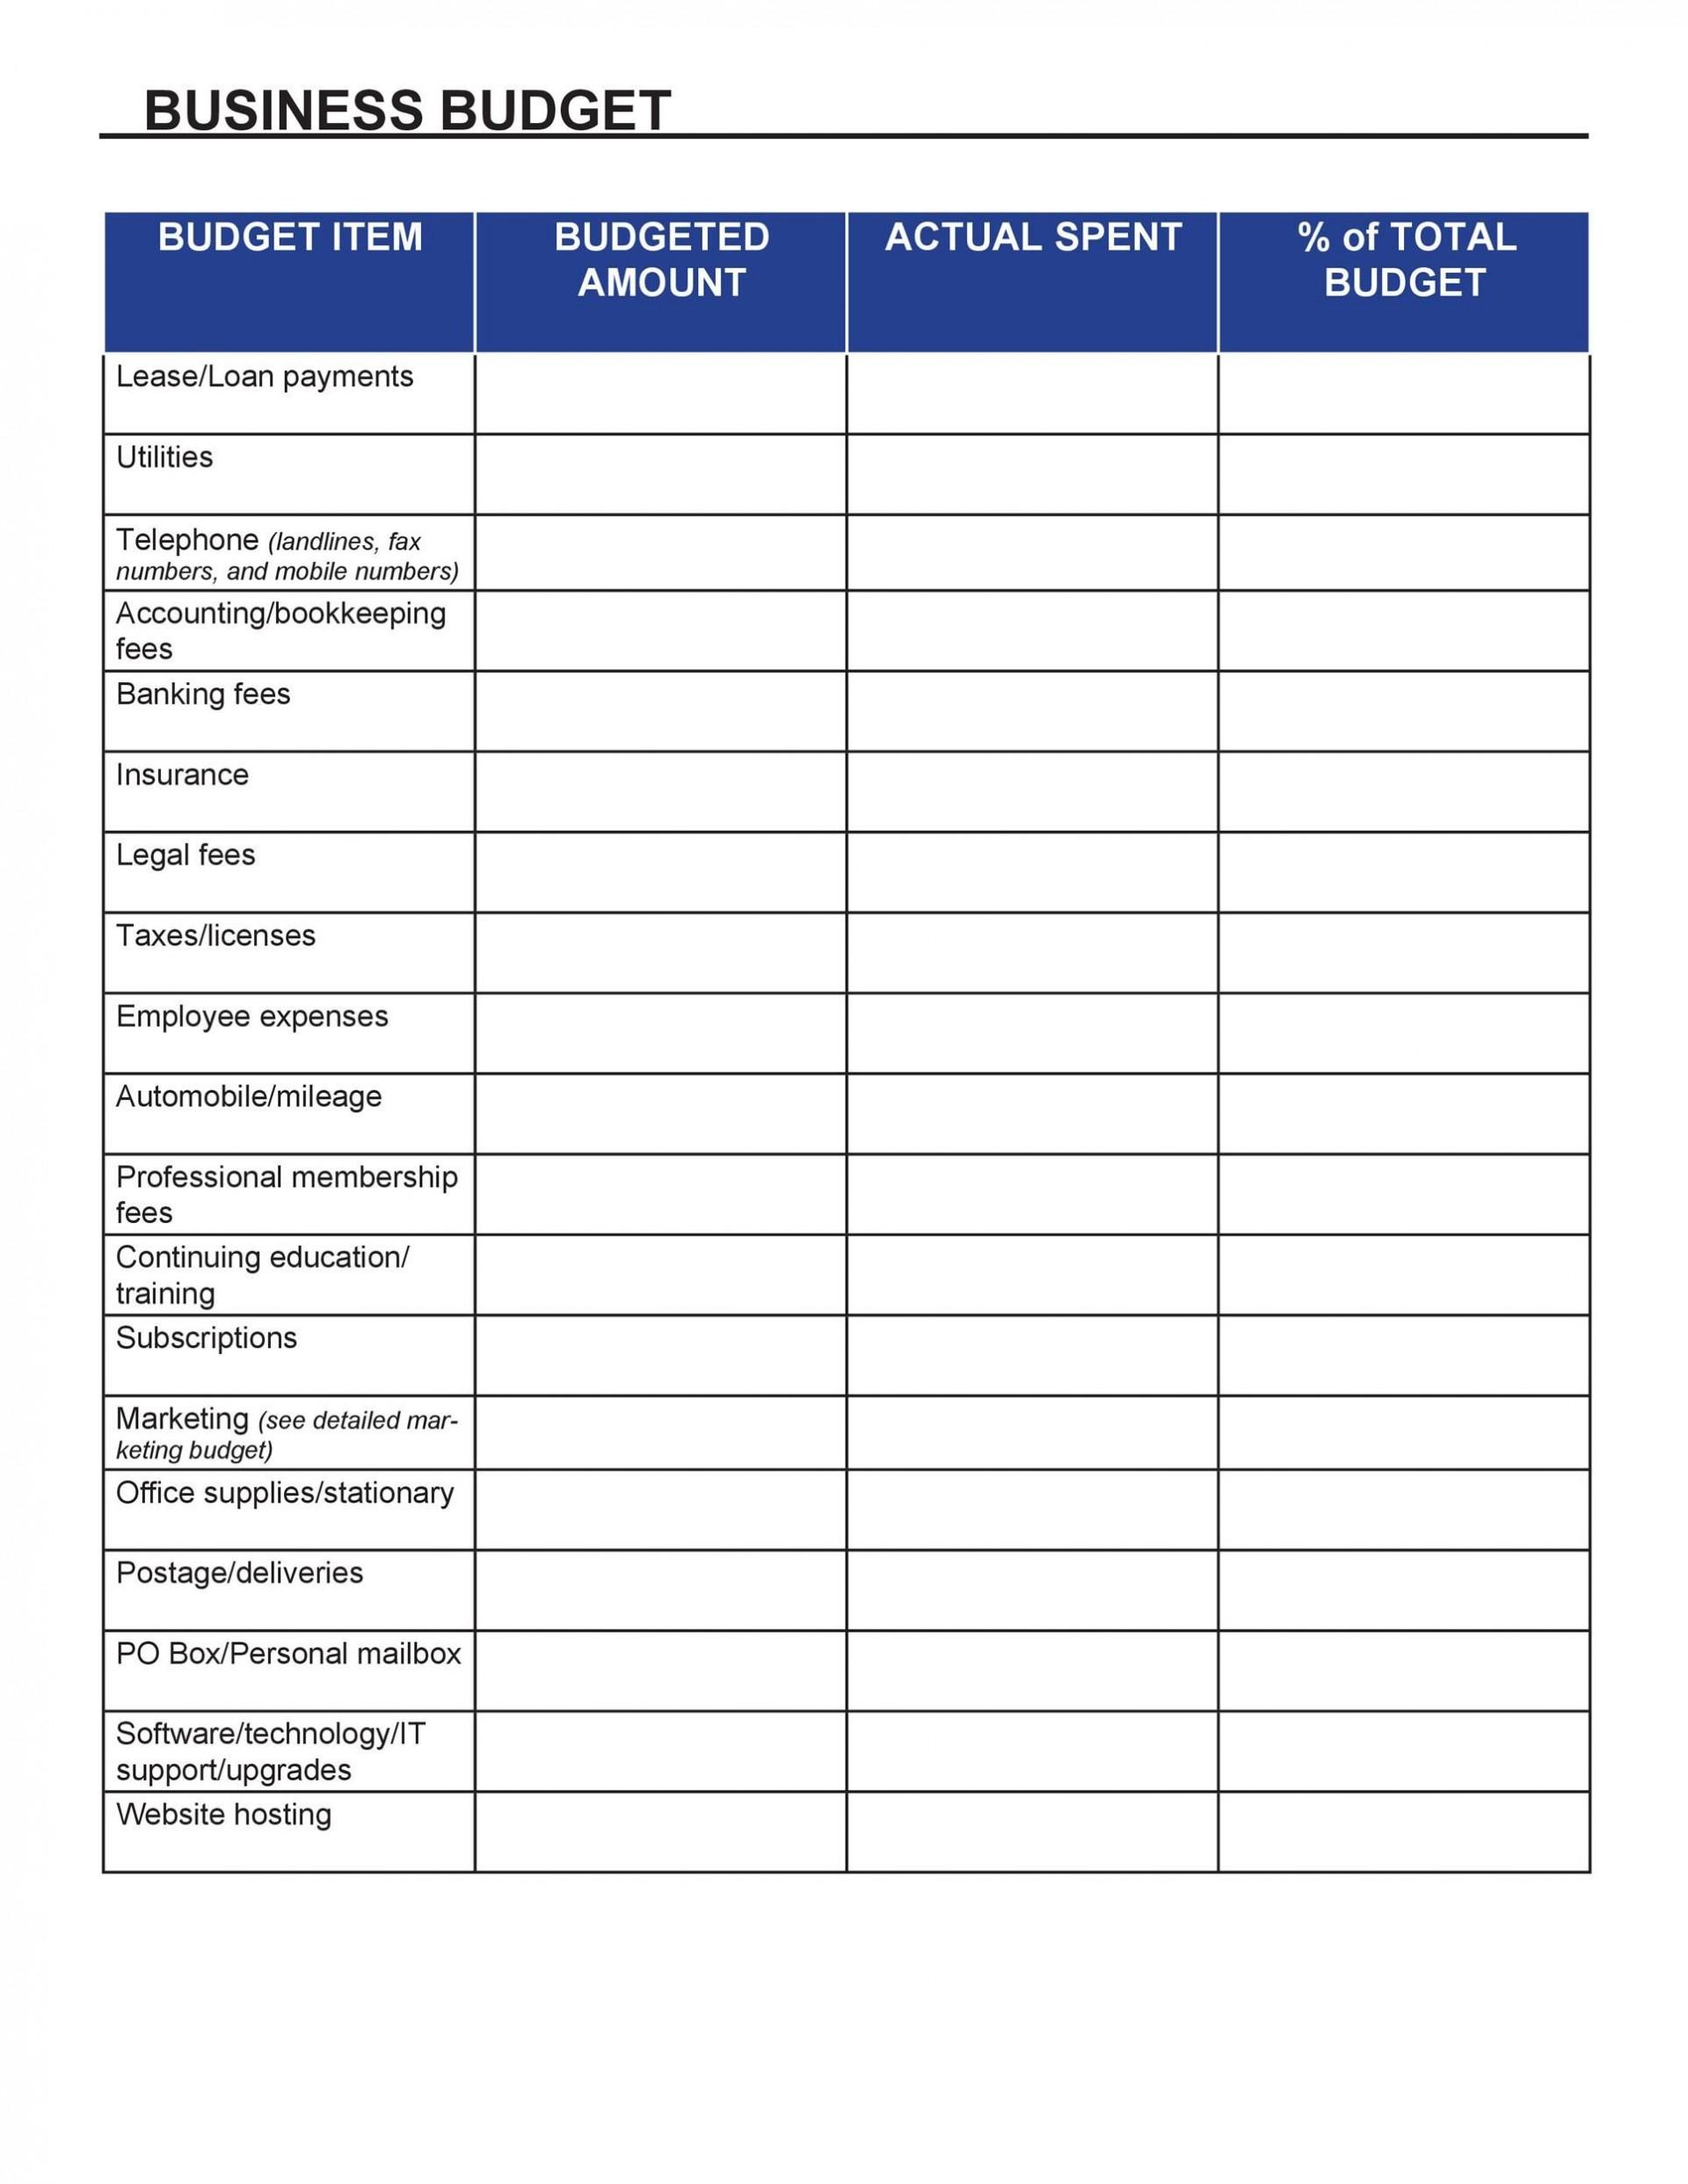 002 Excellent Busines Plan Budget Template Inspiration  Free Excel1920